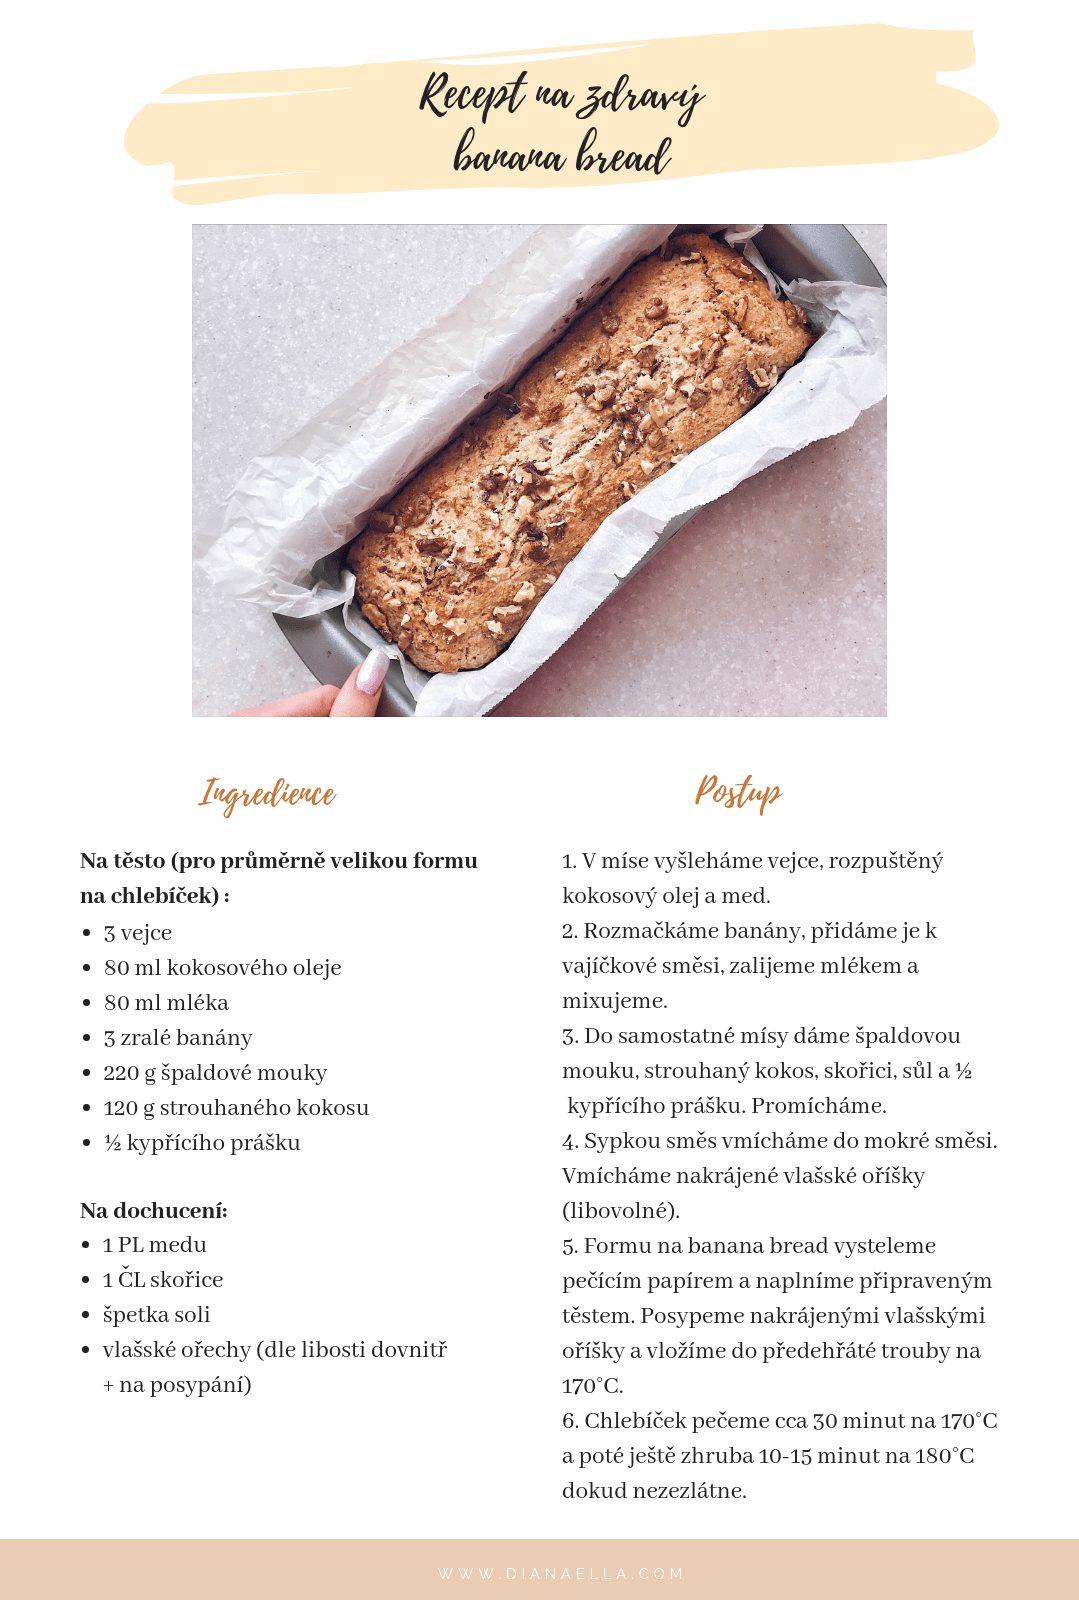 Recept na zdravý banana bread